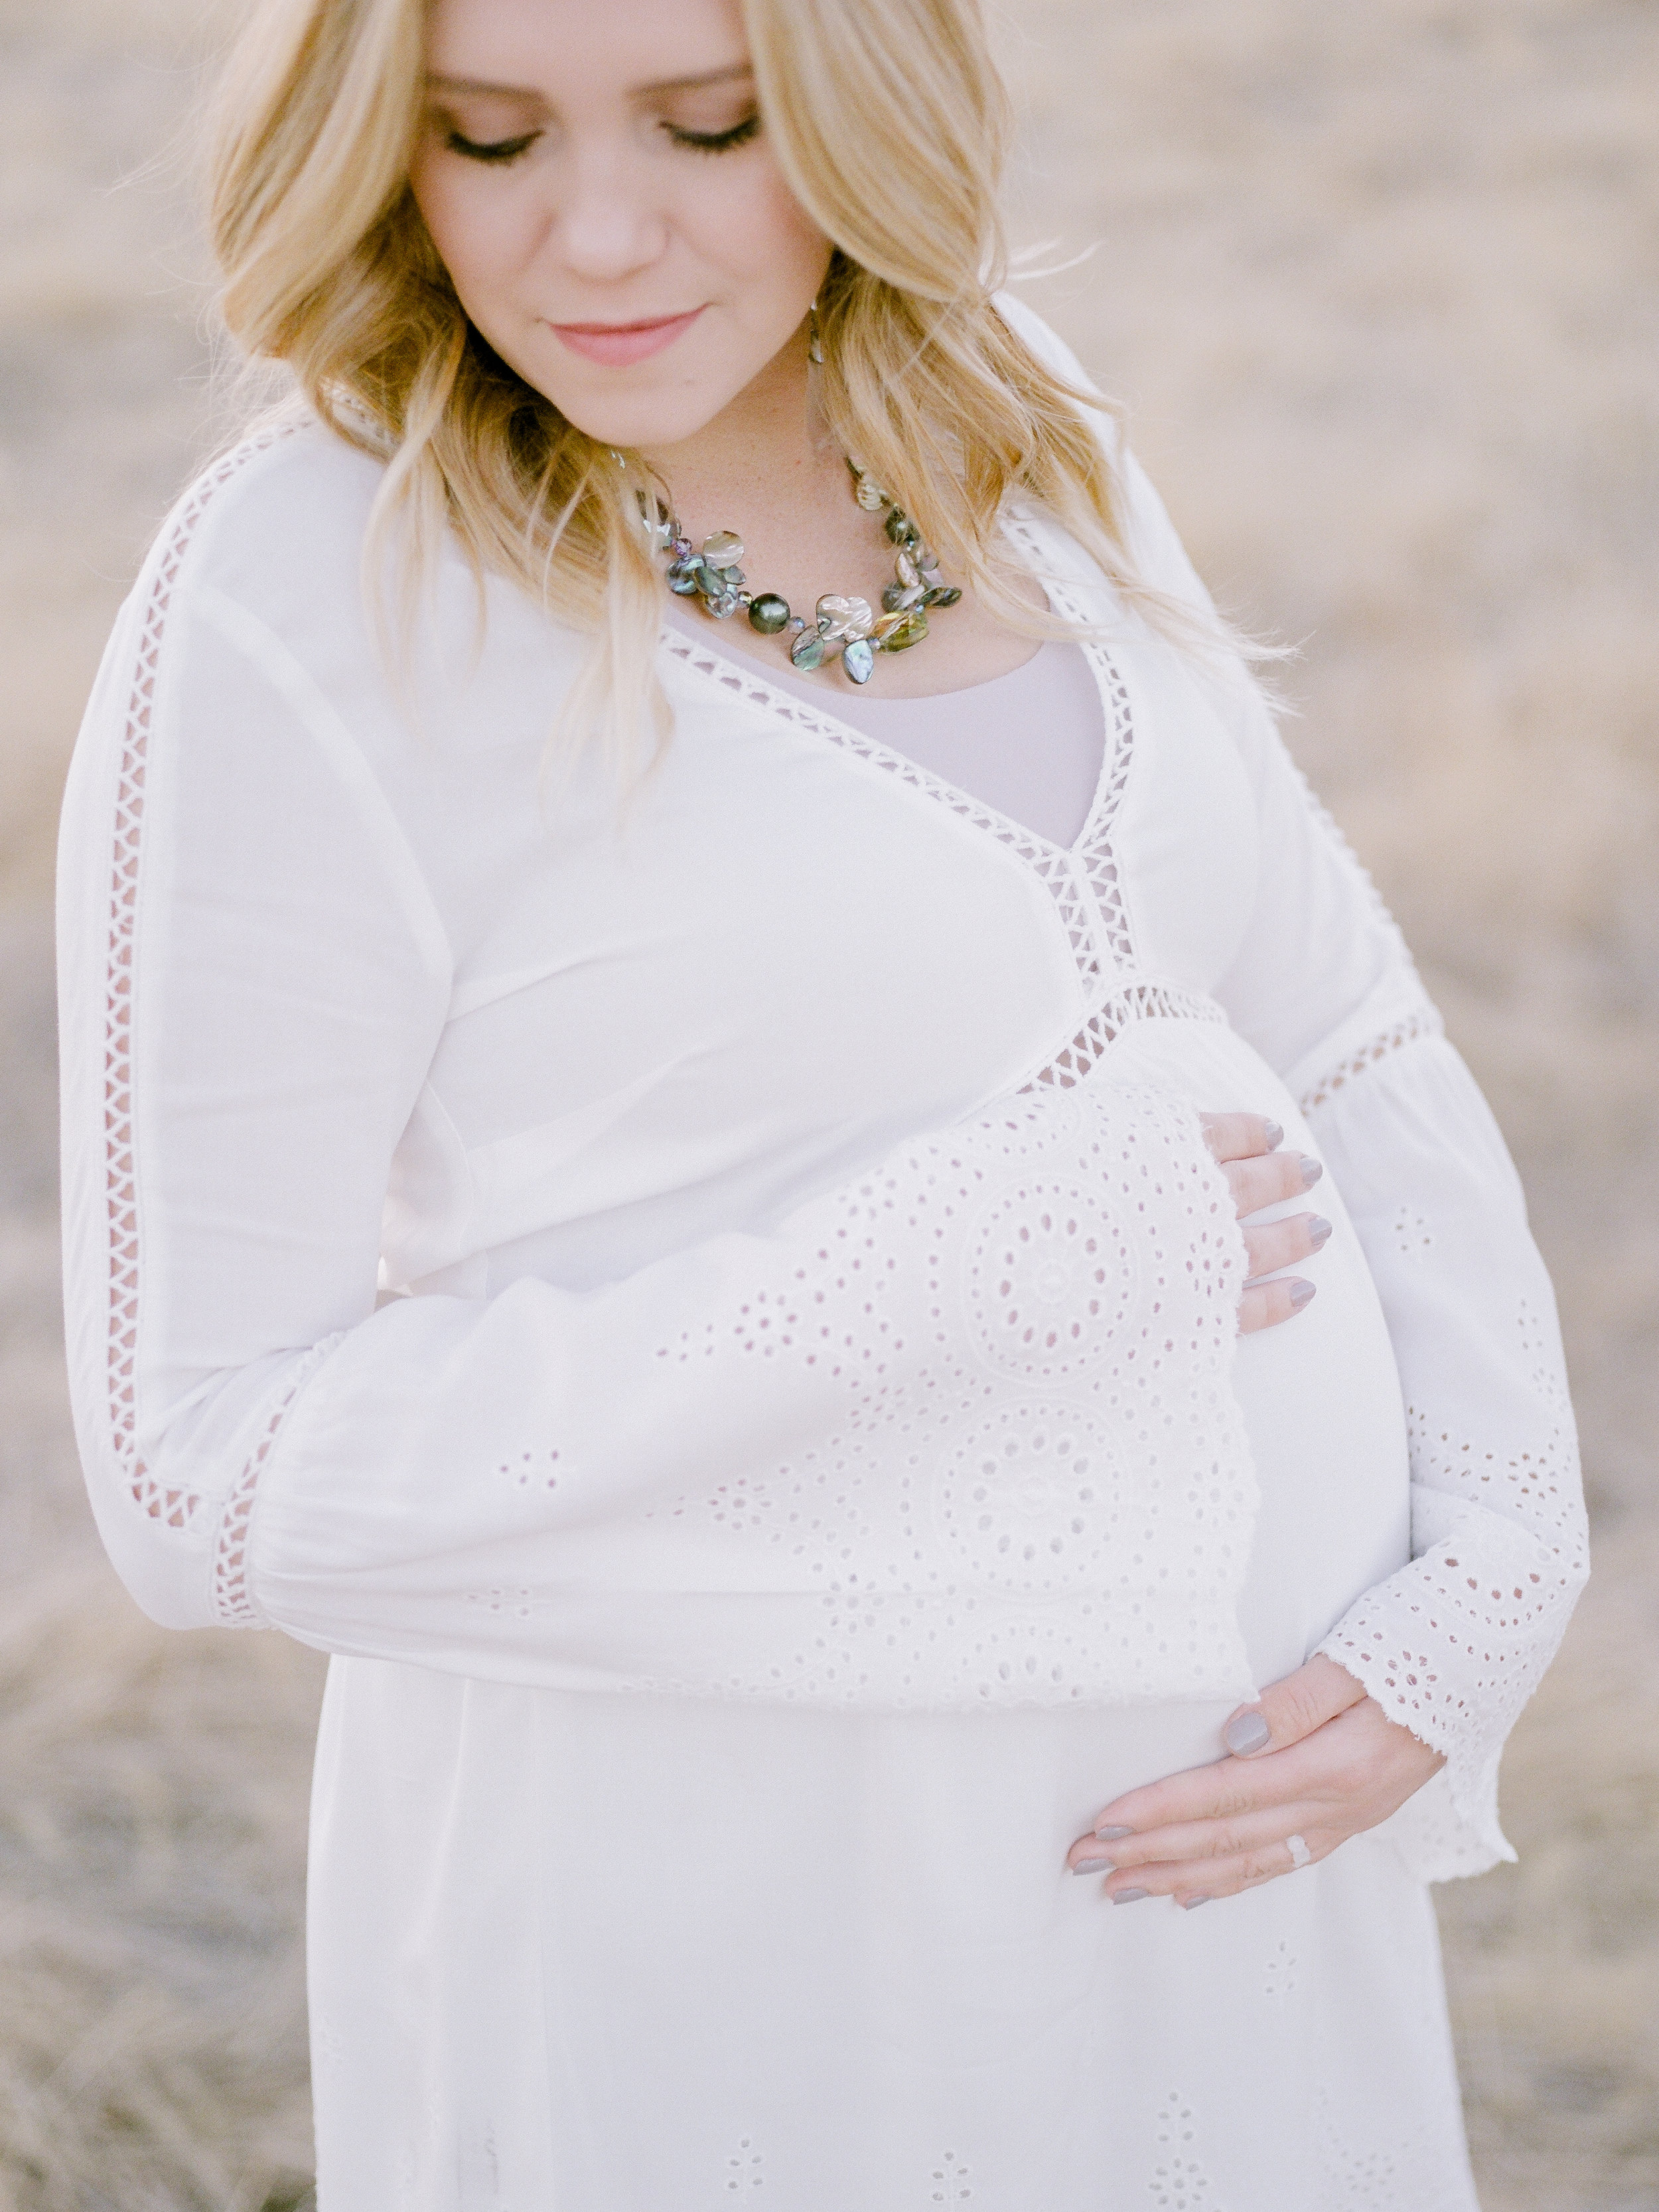 99Chico-Maternity-Photographer (30 of).jpg